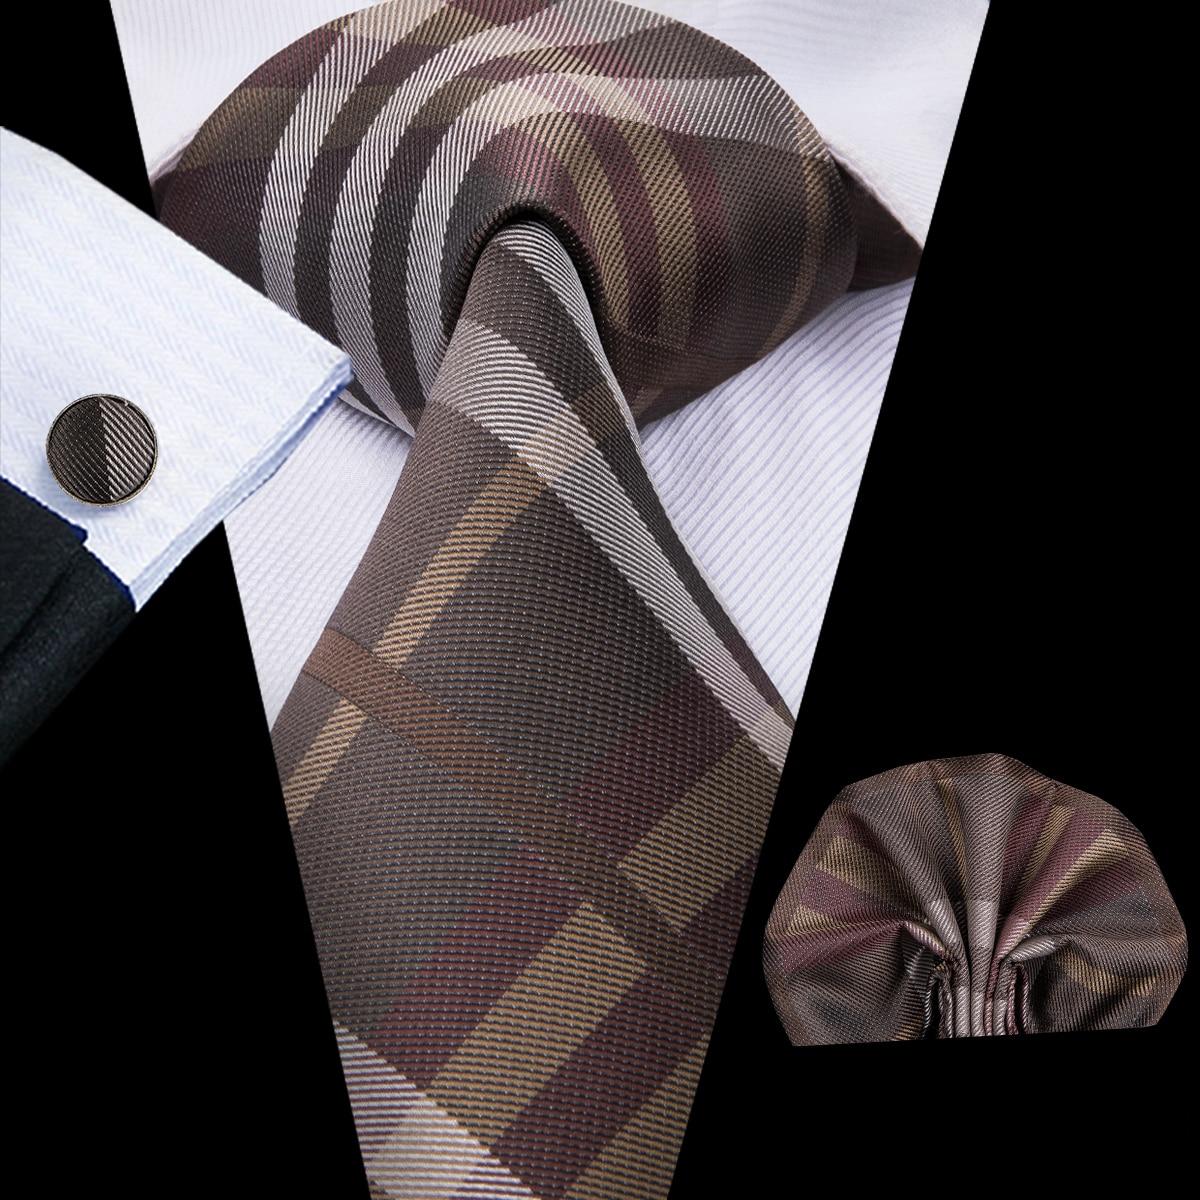 C-3014 Hi-Tie Men Tie Silk Necktie Plaid Brown Ties For Men High Quality Hanky Cufflinks Set Men's Wedding Pocket Square Tie Set